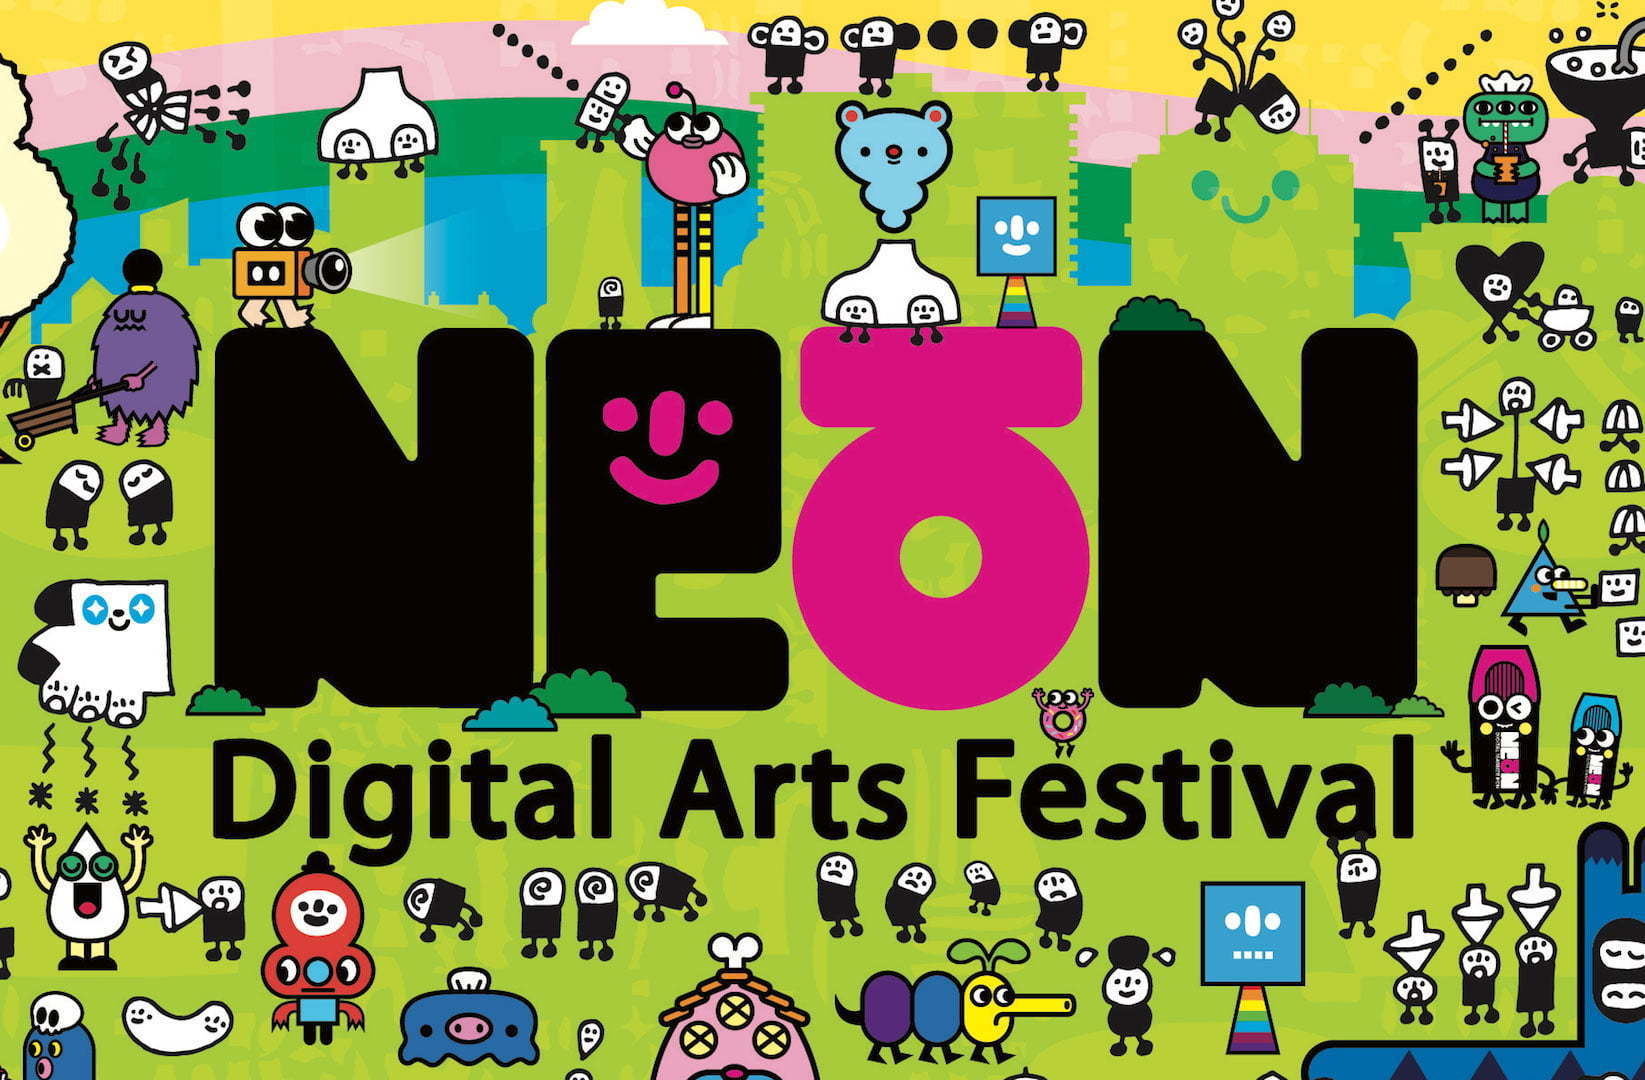 Image: NEoN Logo with Pictoplasma characters